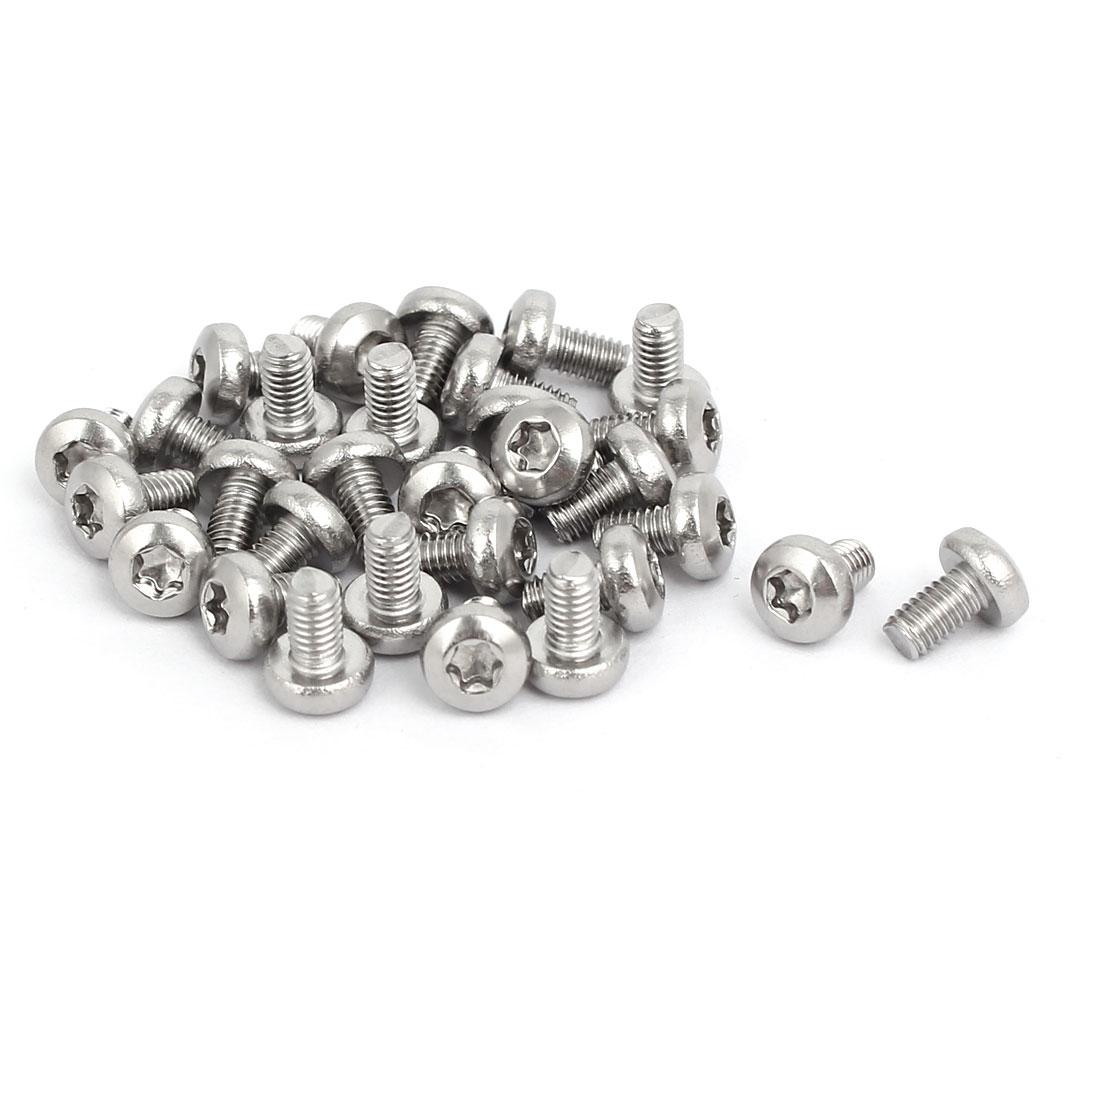 M3x5mm 304 Stainless Steel Button Head Torx Screws Bolts T10 Drive 30pcs